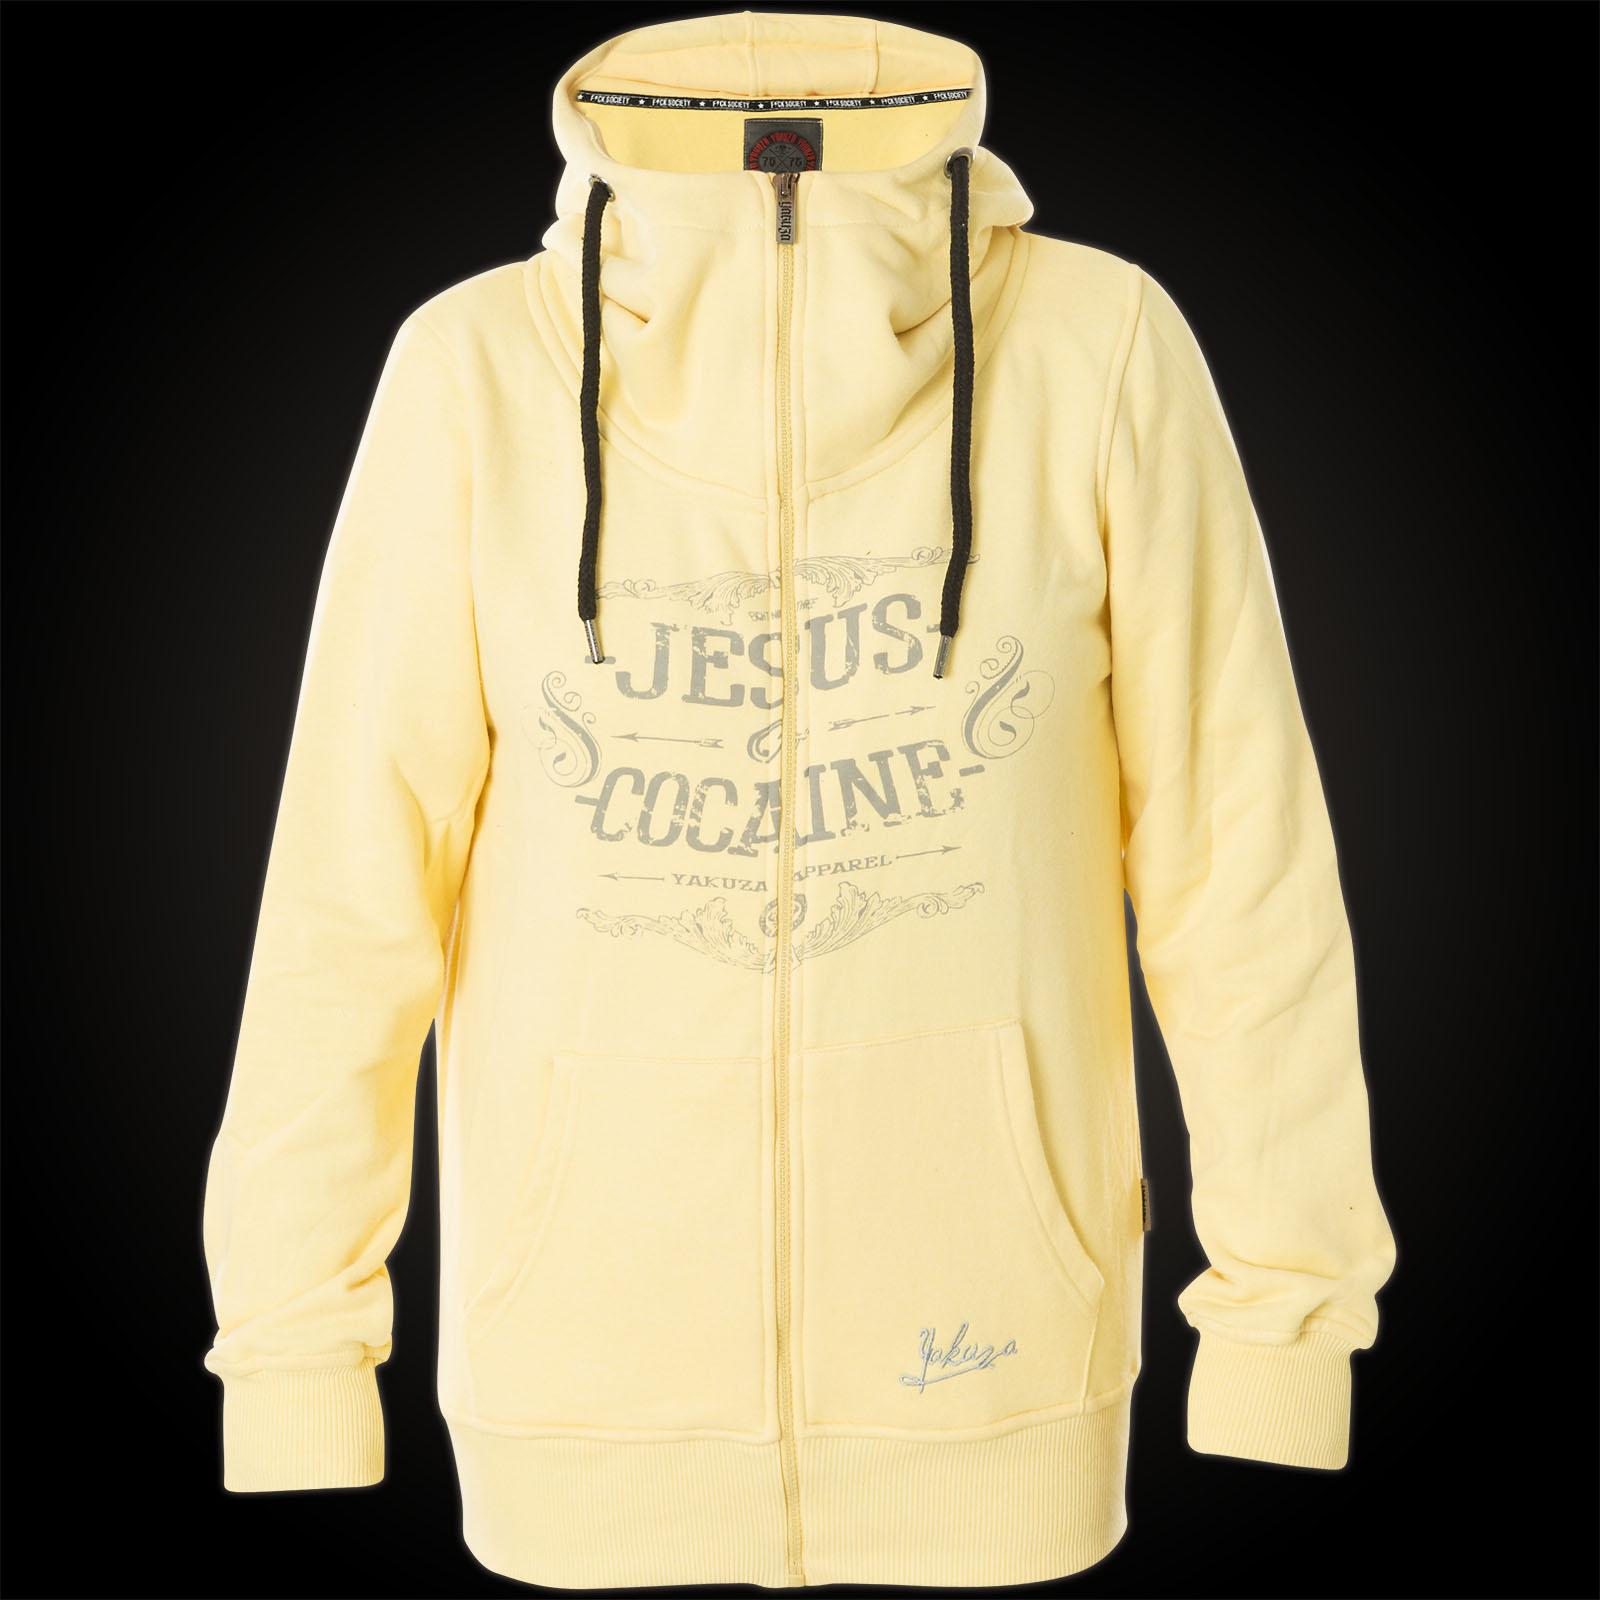 Yakuza Damen Hoody Jesus Or Cocain GHZB 9135 Pale Banana Gelb